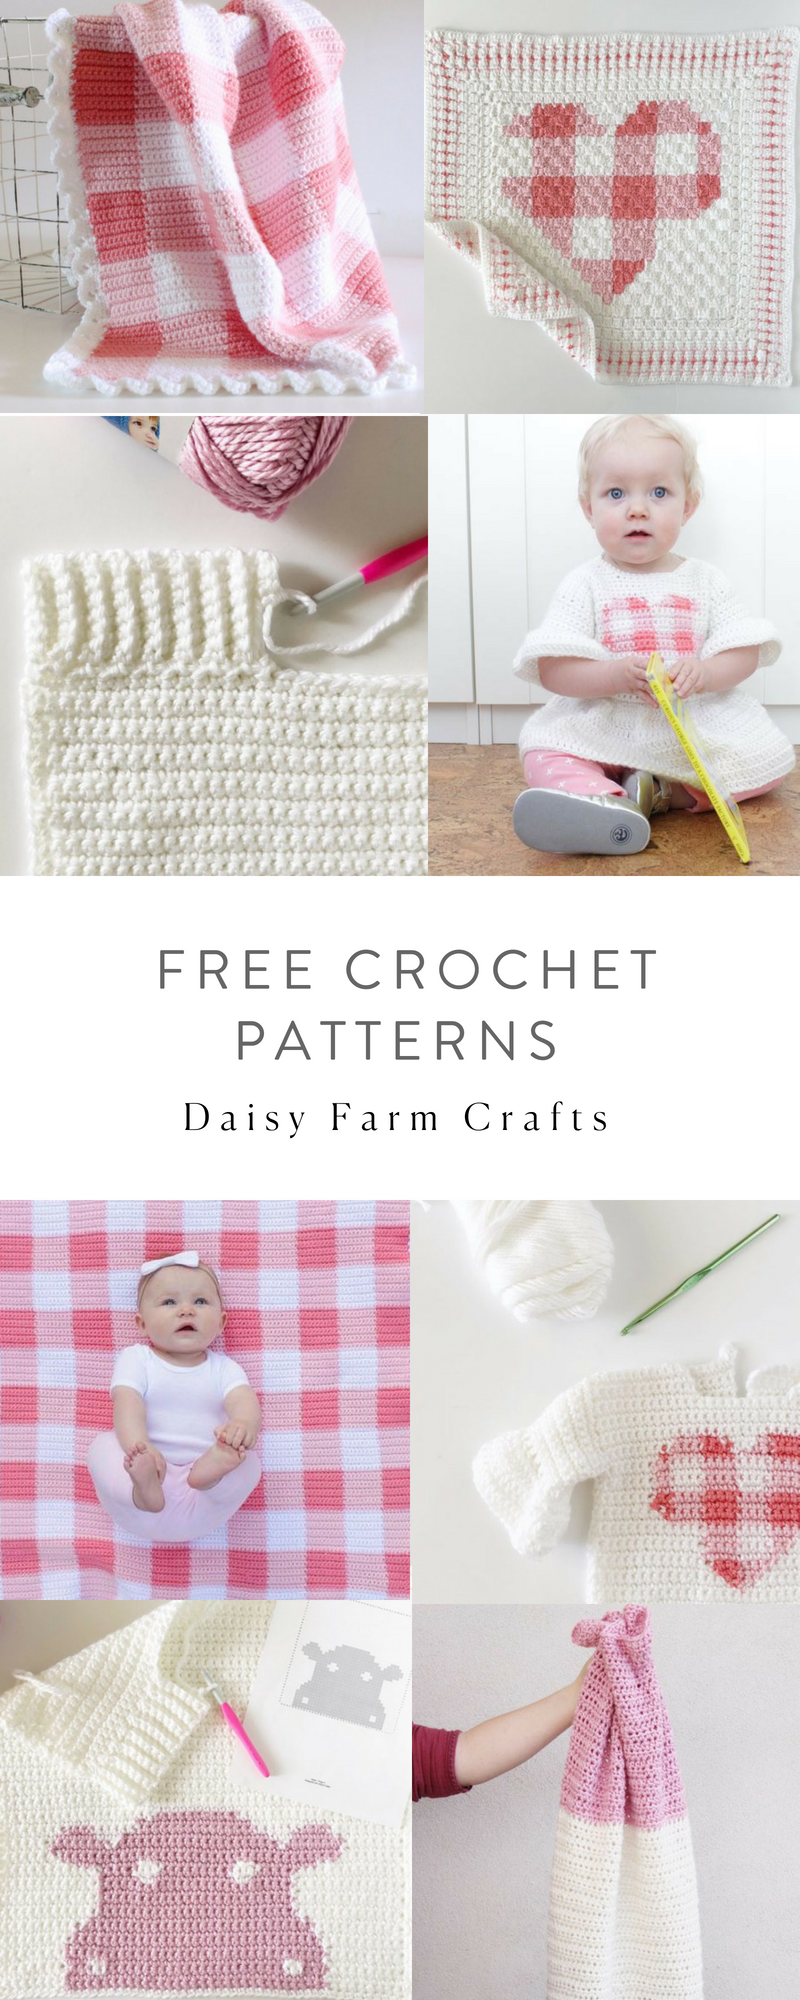 Free Crochet Patterns - Daisy Farm Crafts   crochet   Pinterest